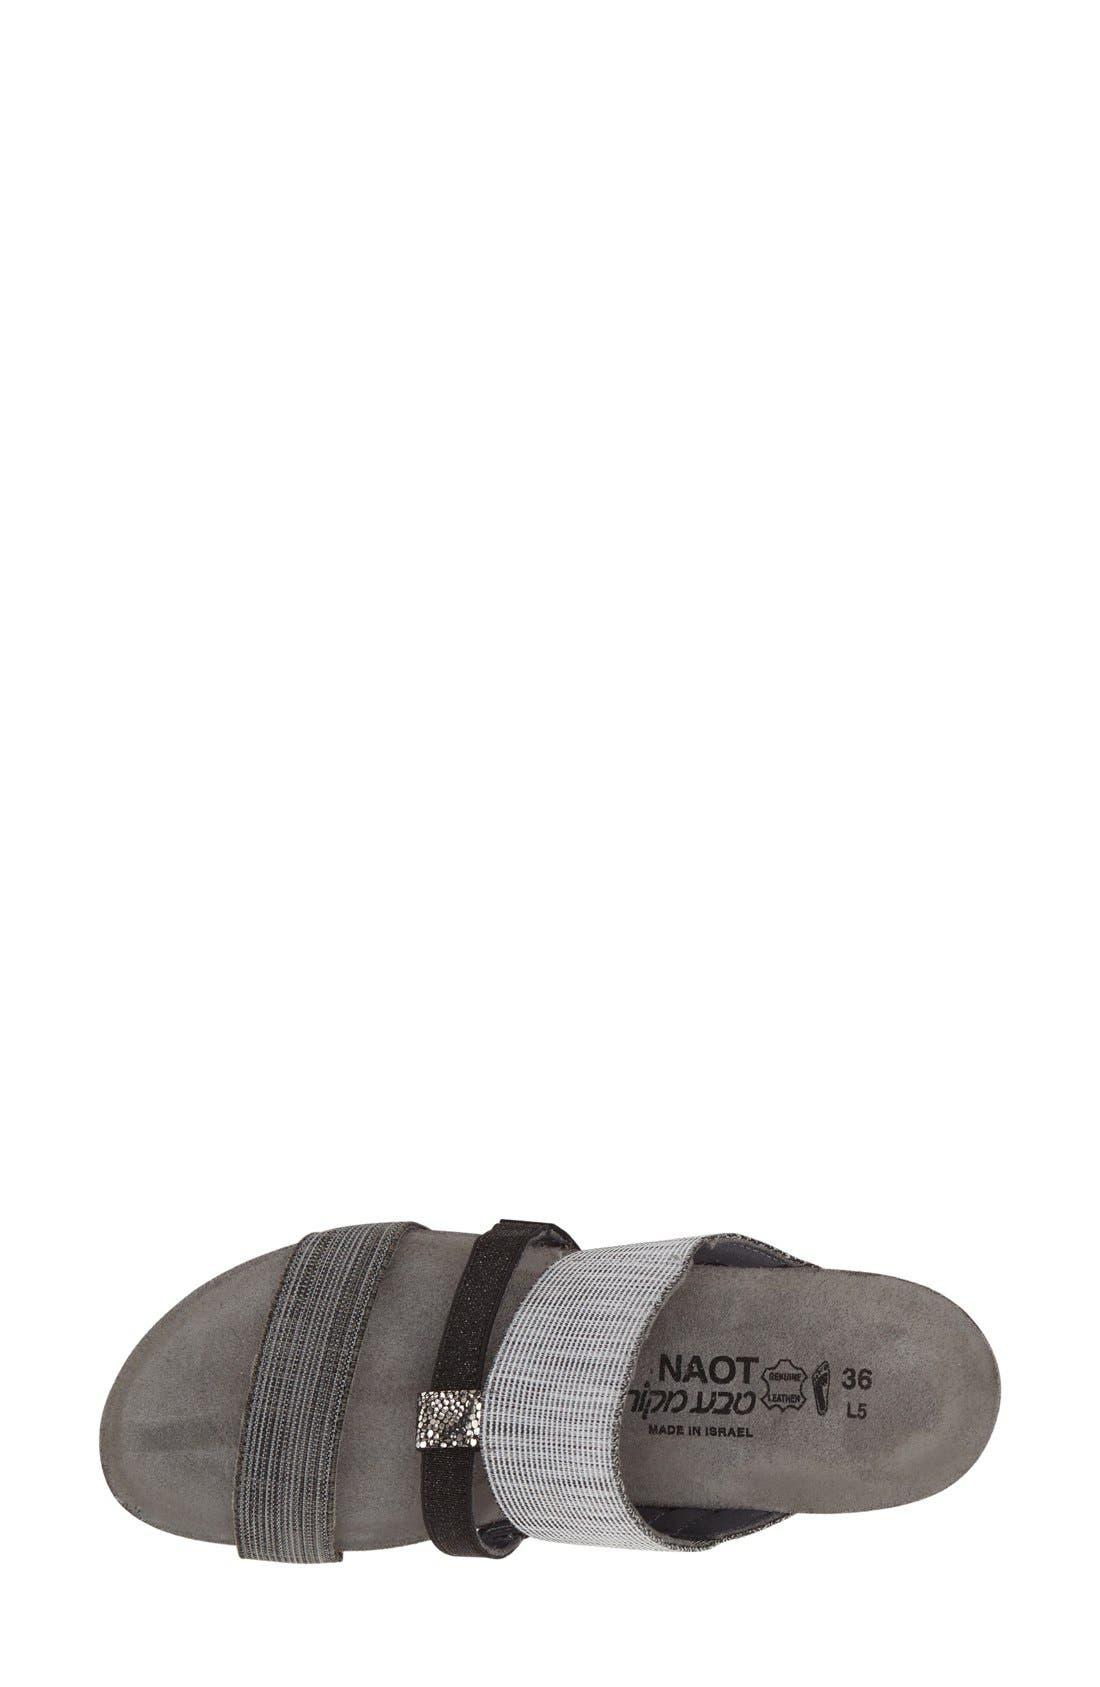 'Brenda' Slip-On Sandal,                             Alternate thumbnail 3, color,                             Grey/ Black Leather Fabric